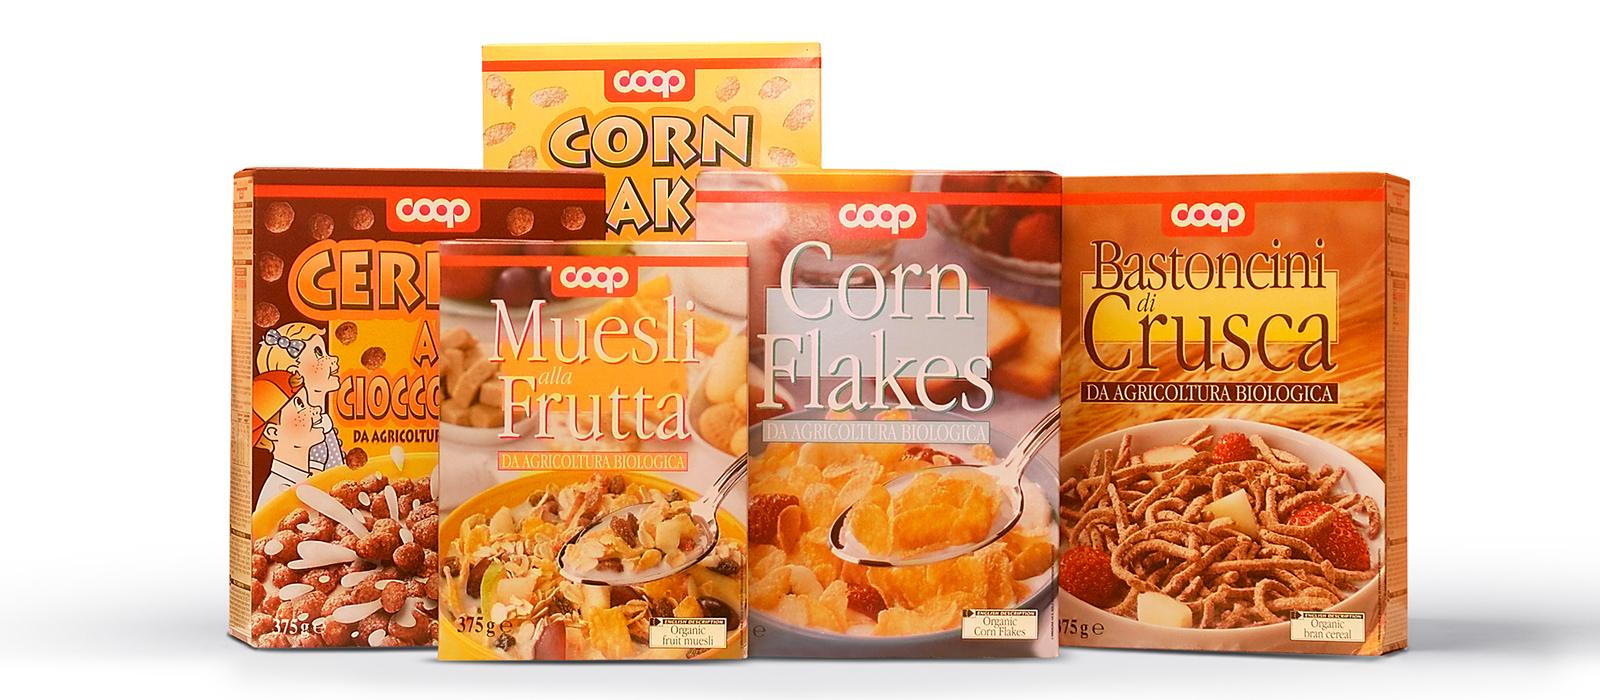 Breakfast-Coop-GDO-Majo